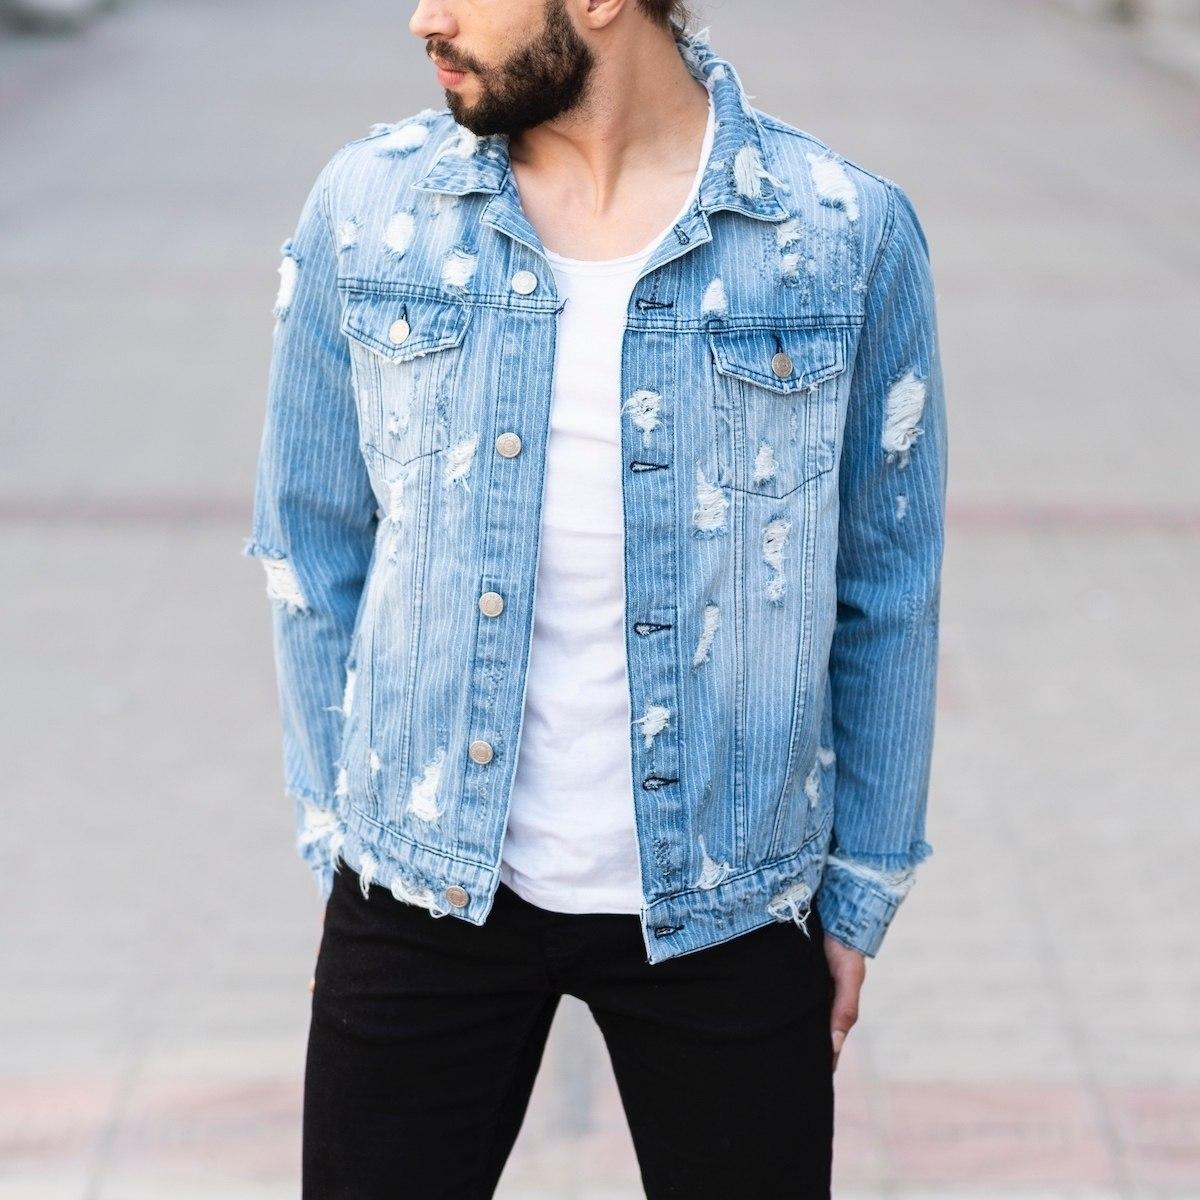 Snow Style Denim Jacket MV Jacket Collection - 1